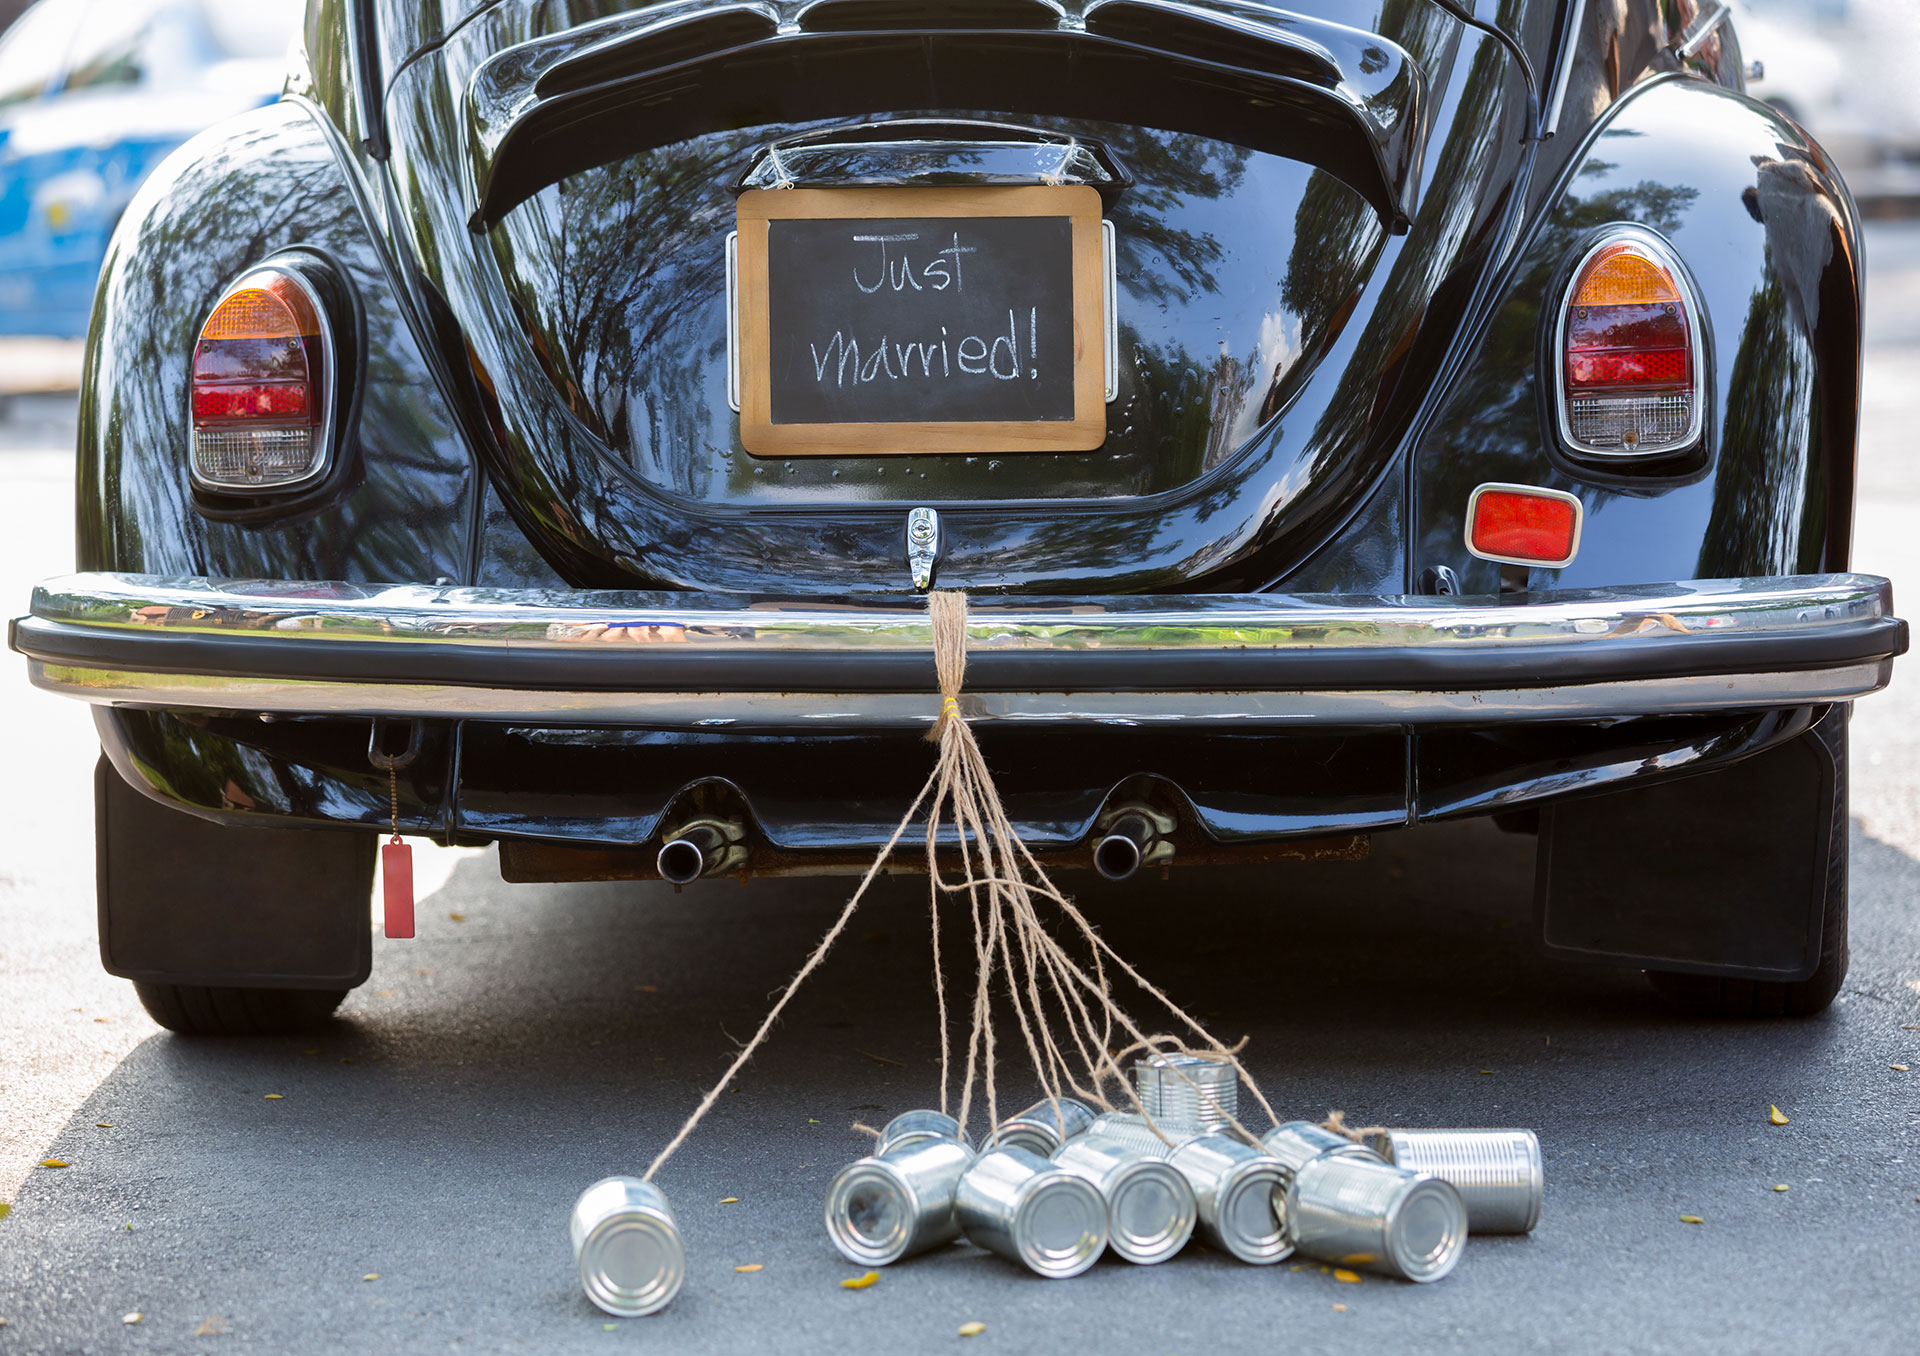 c9a116c5b0ef45e88cdc734f113098c1 - 35 Ways to save £500 on your wedding!